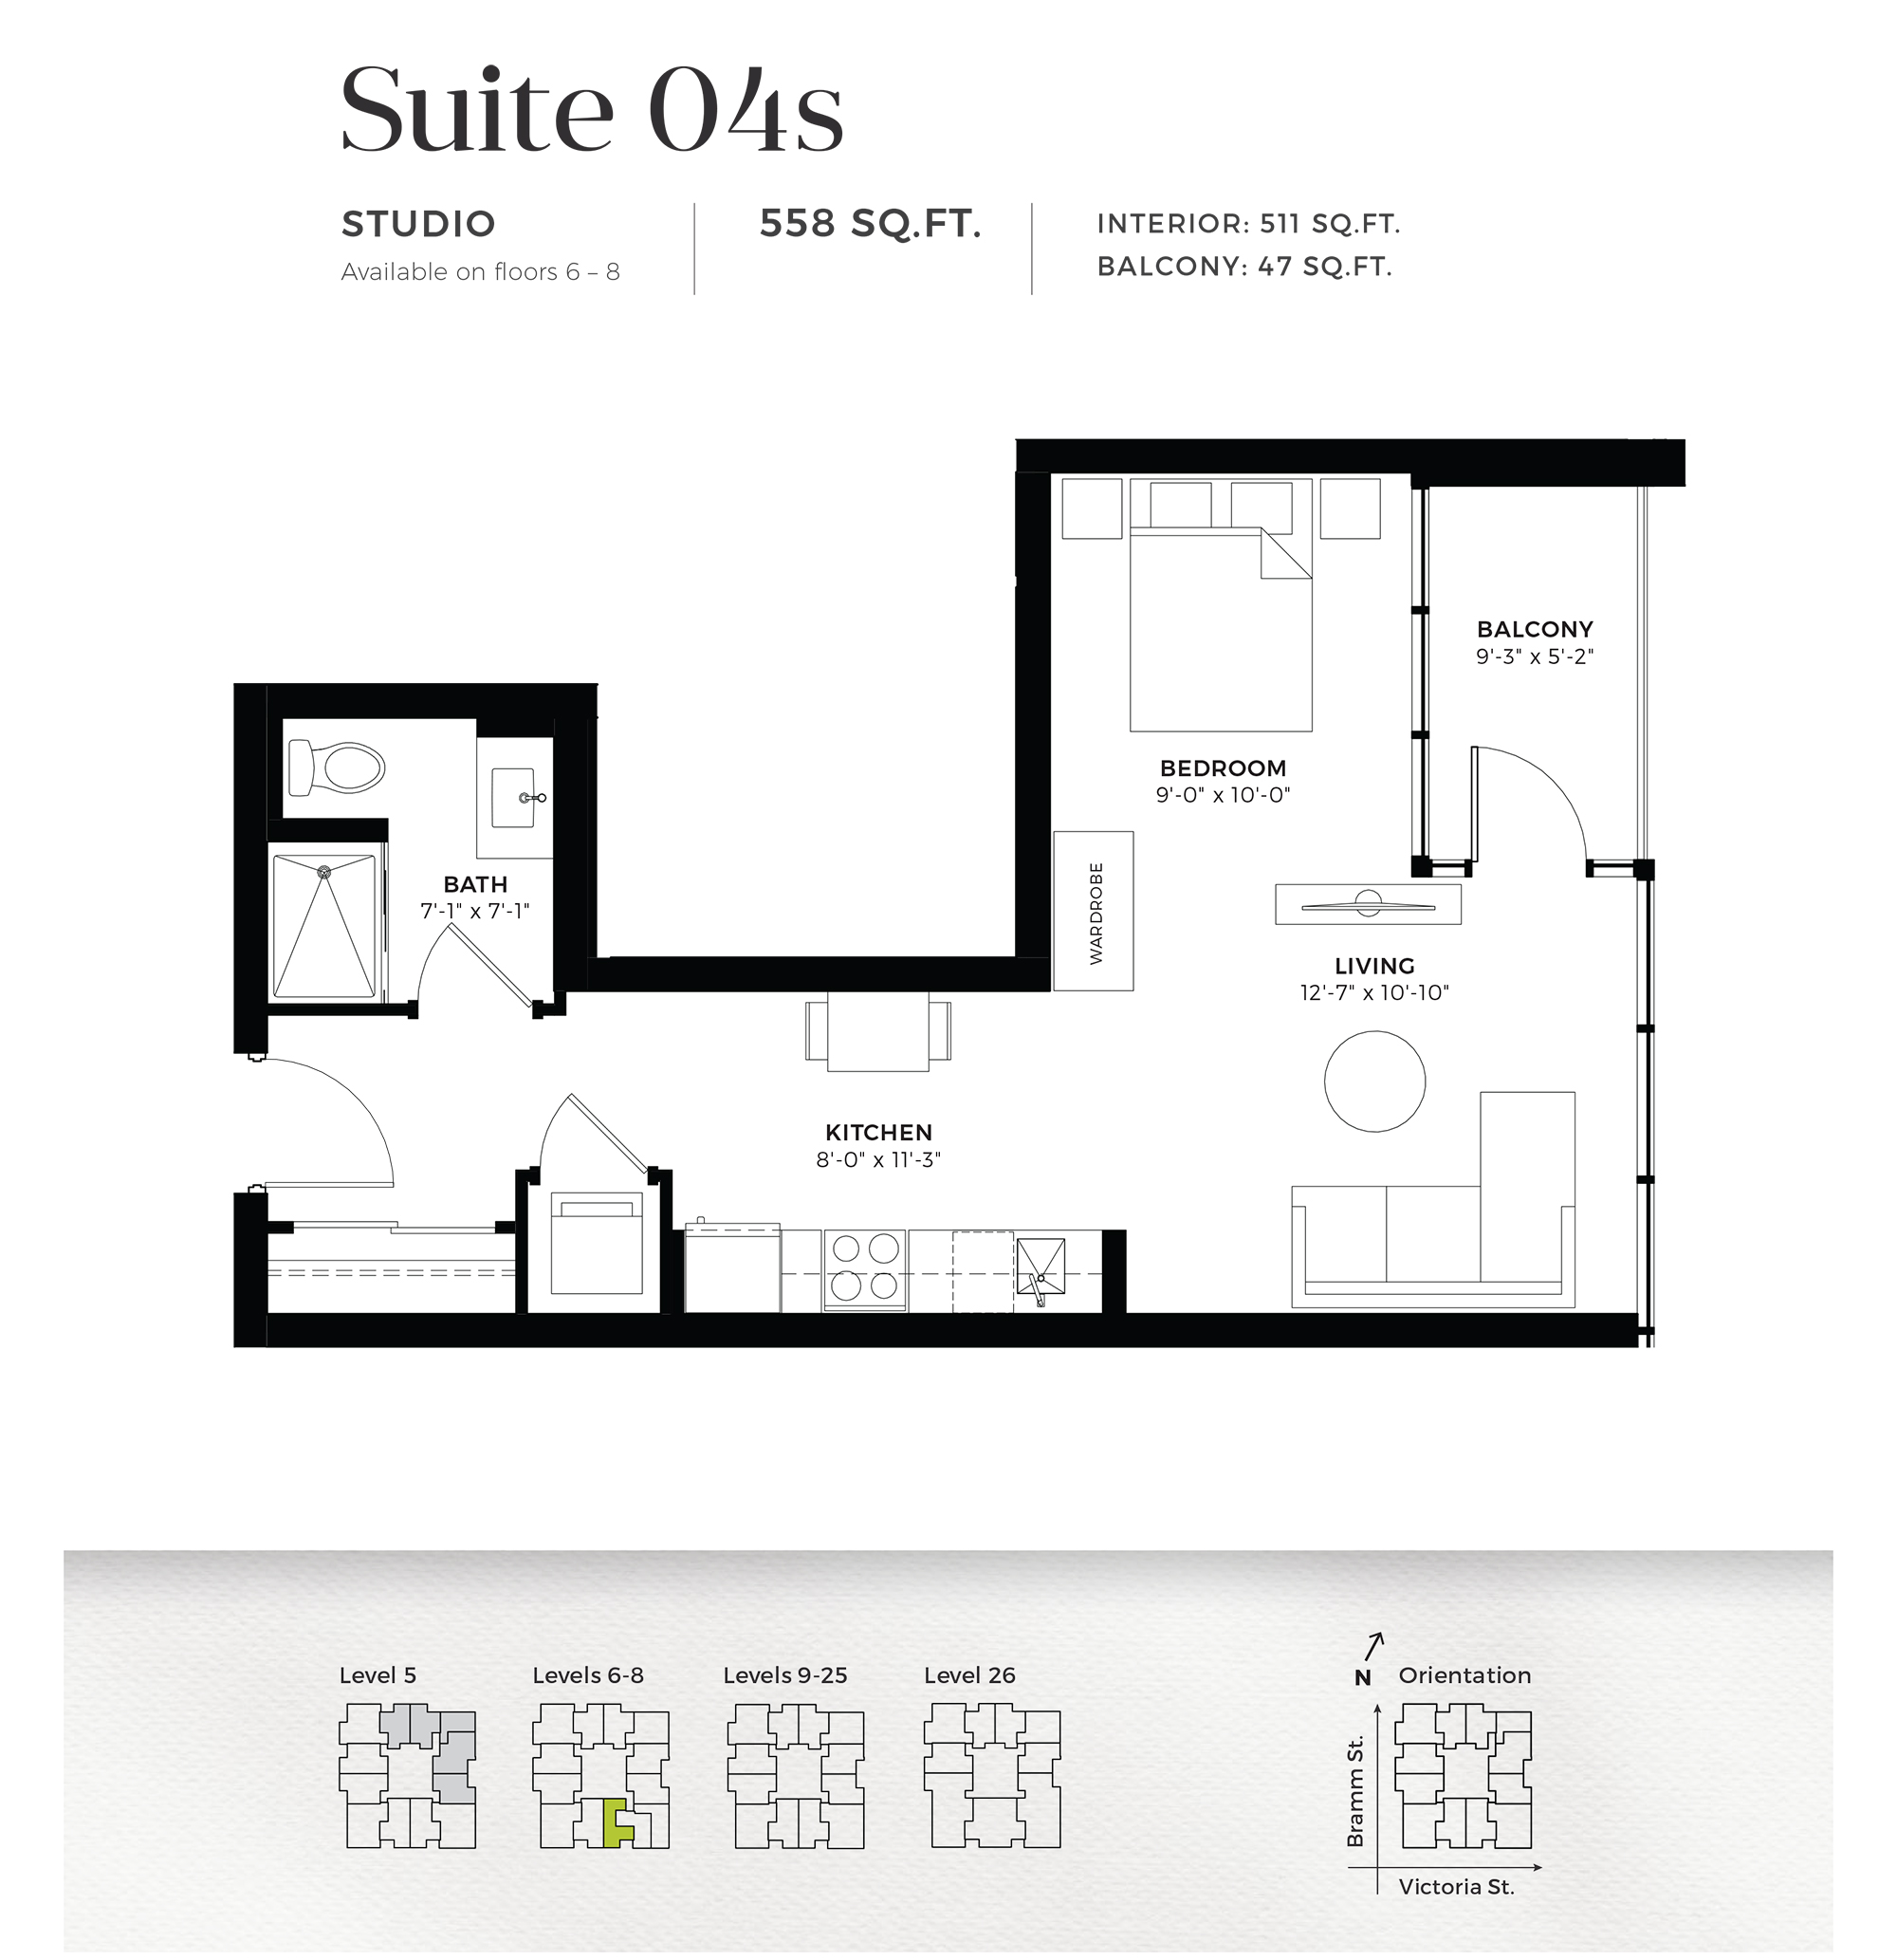 Suite 04s